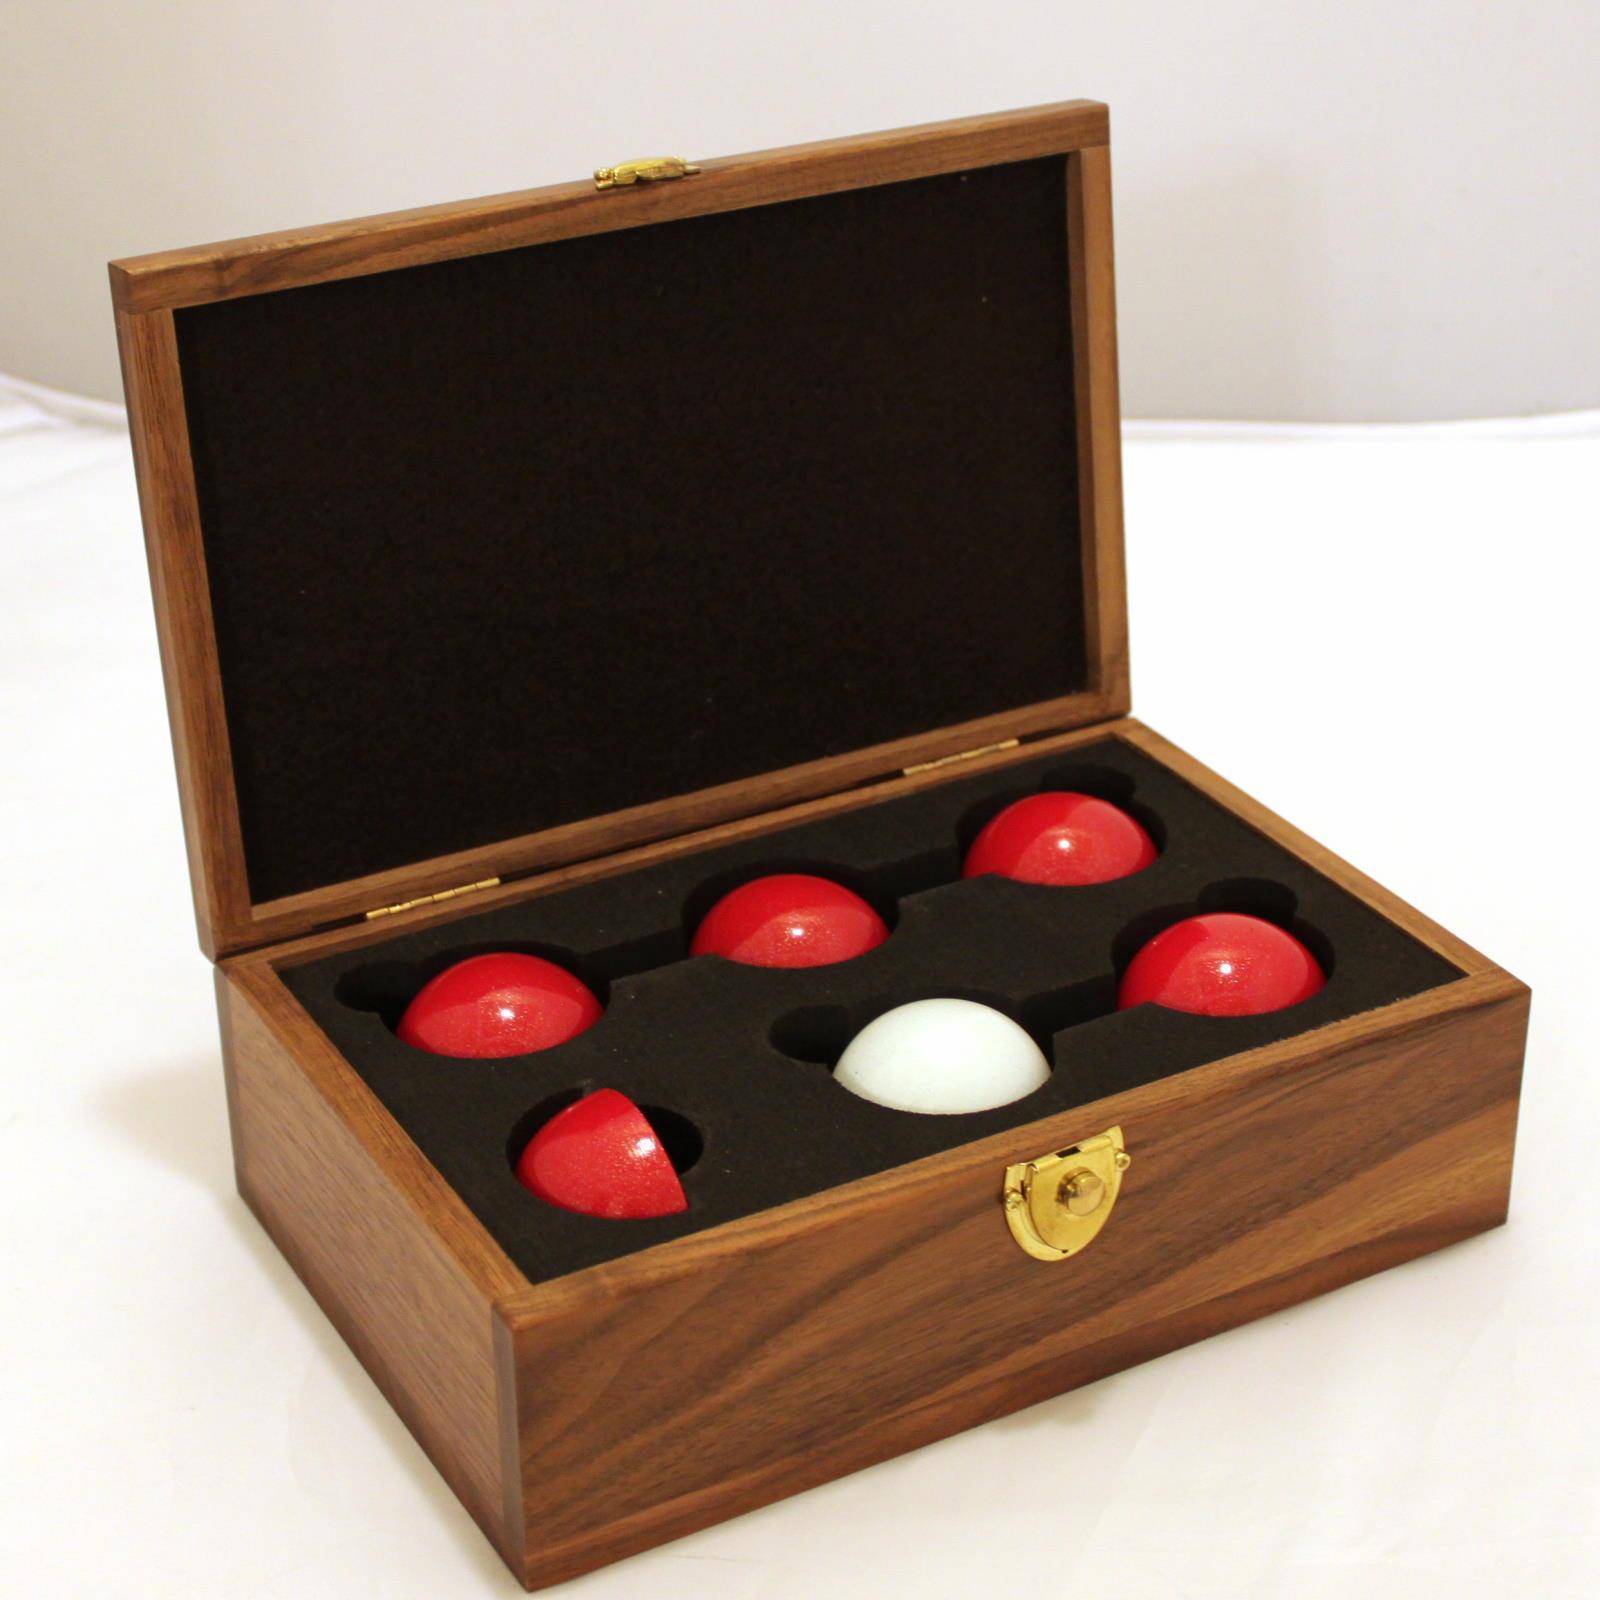 Deluxe Billiard Ball Set by Collectors' Workshop